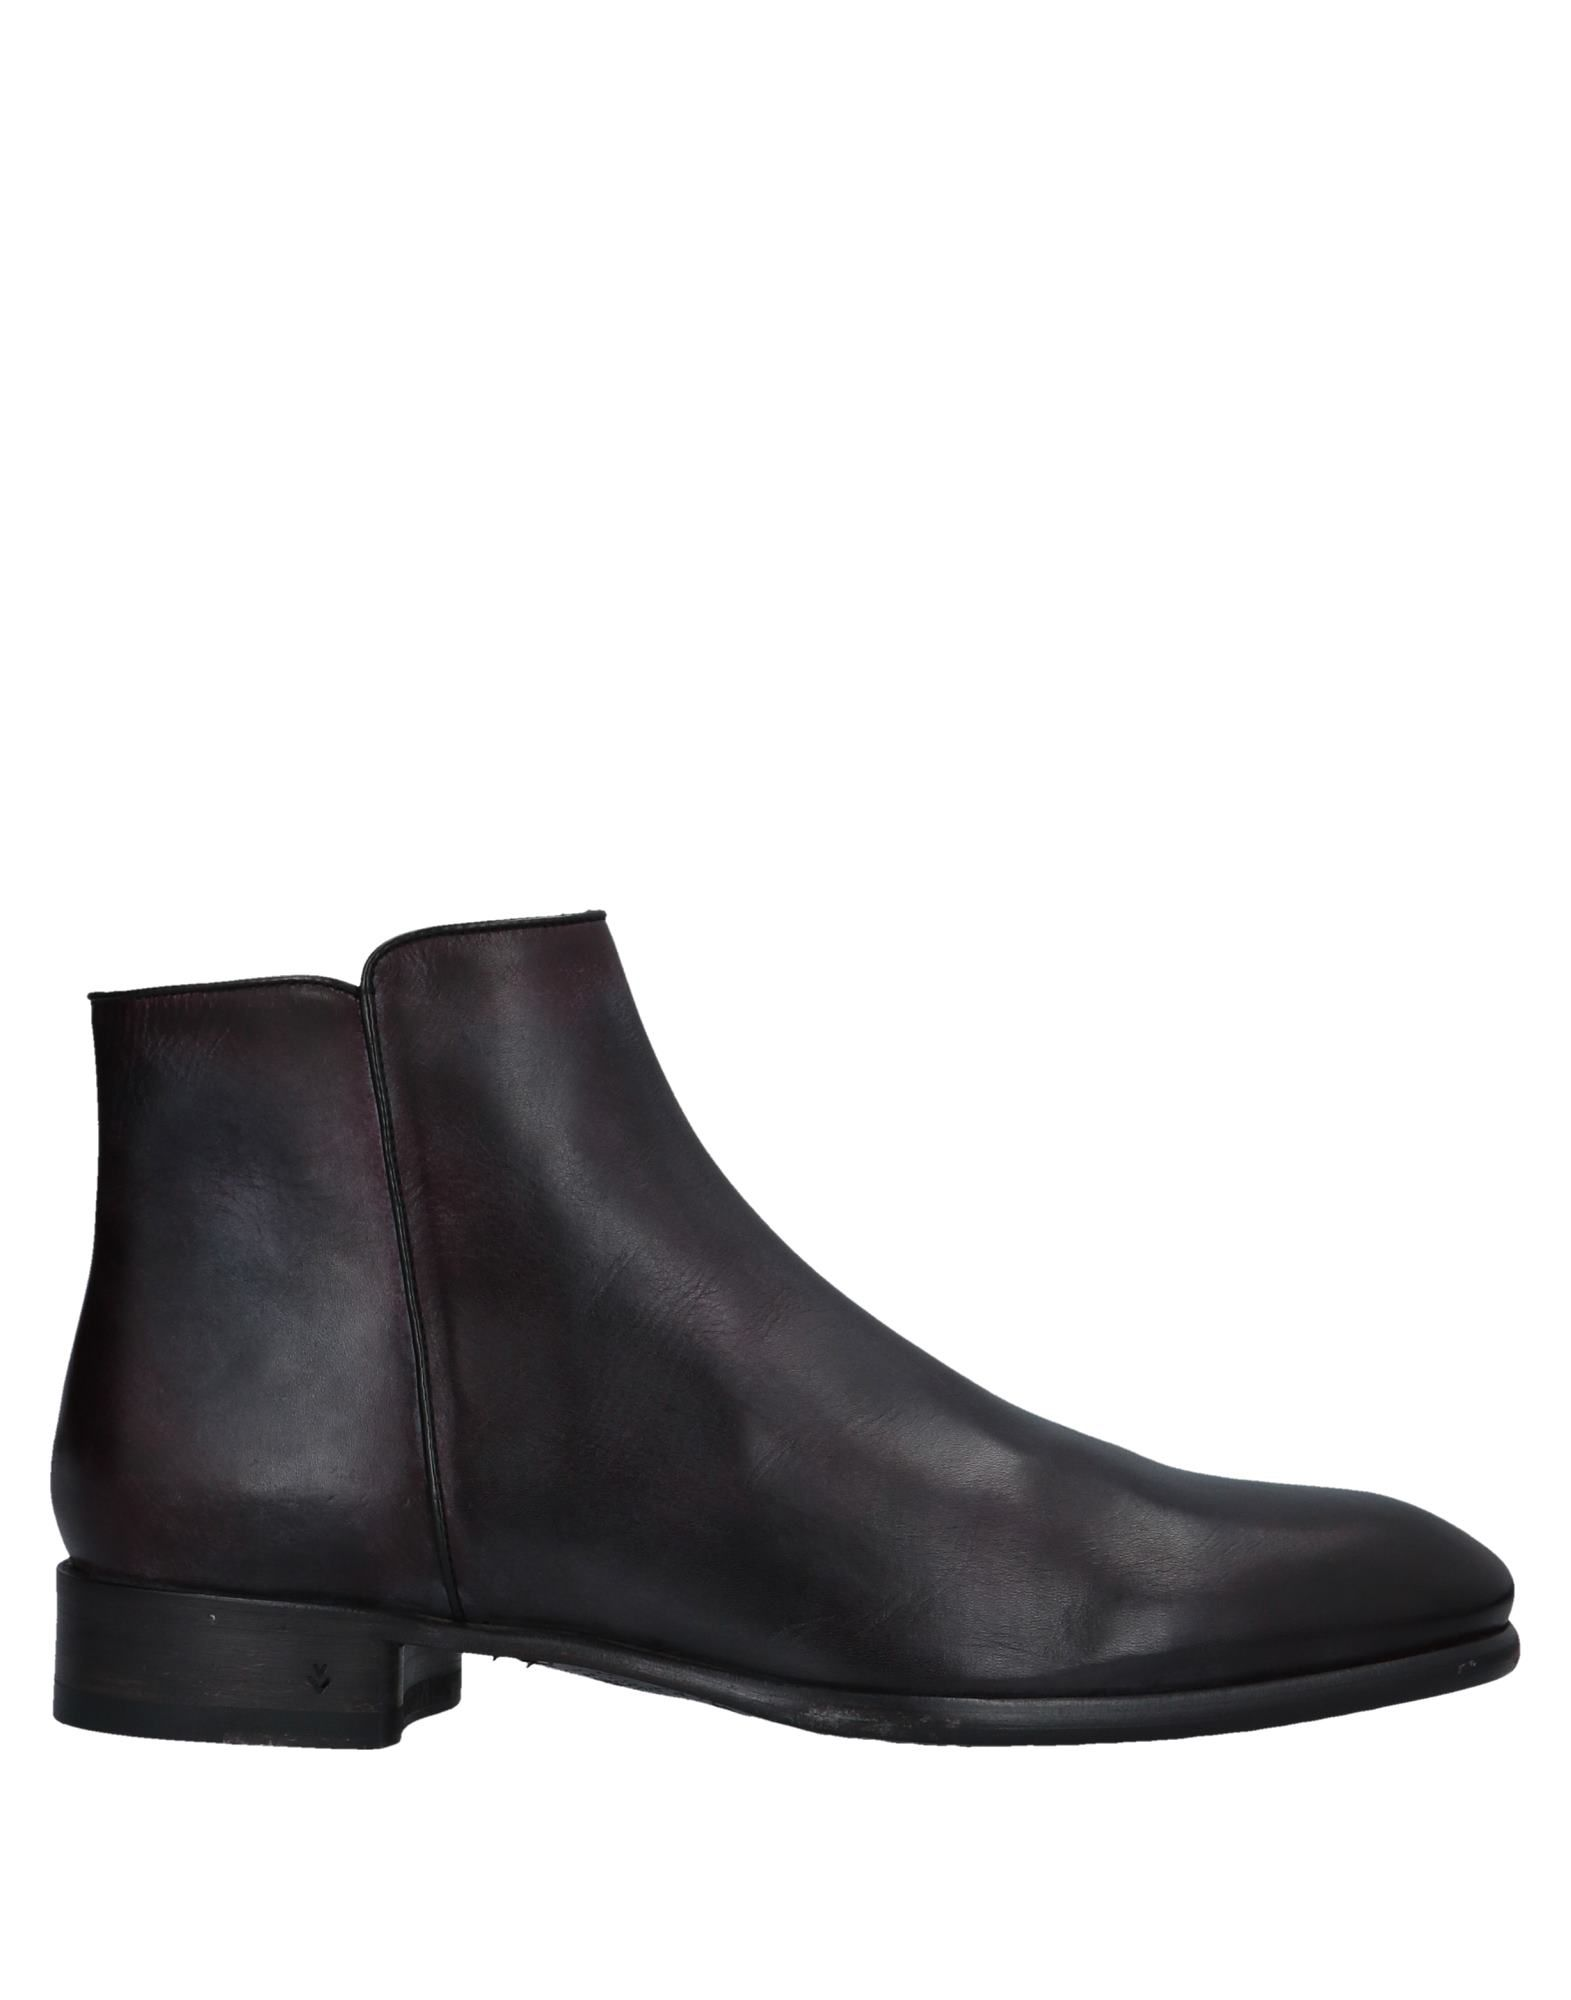 John John Varvatos Boots - Men John John Varvatos Boots online on  United Kingdom - 11535836MI b2838c